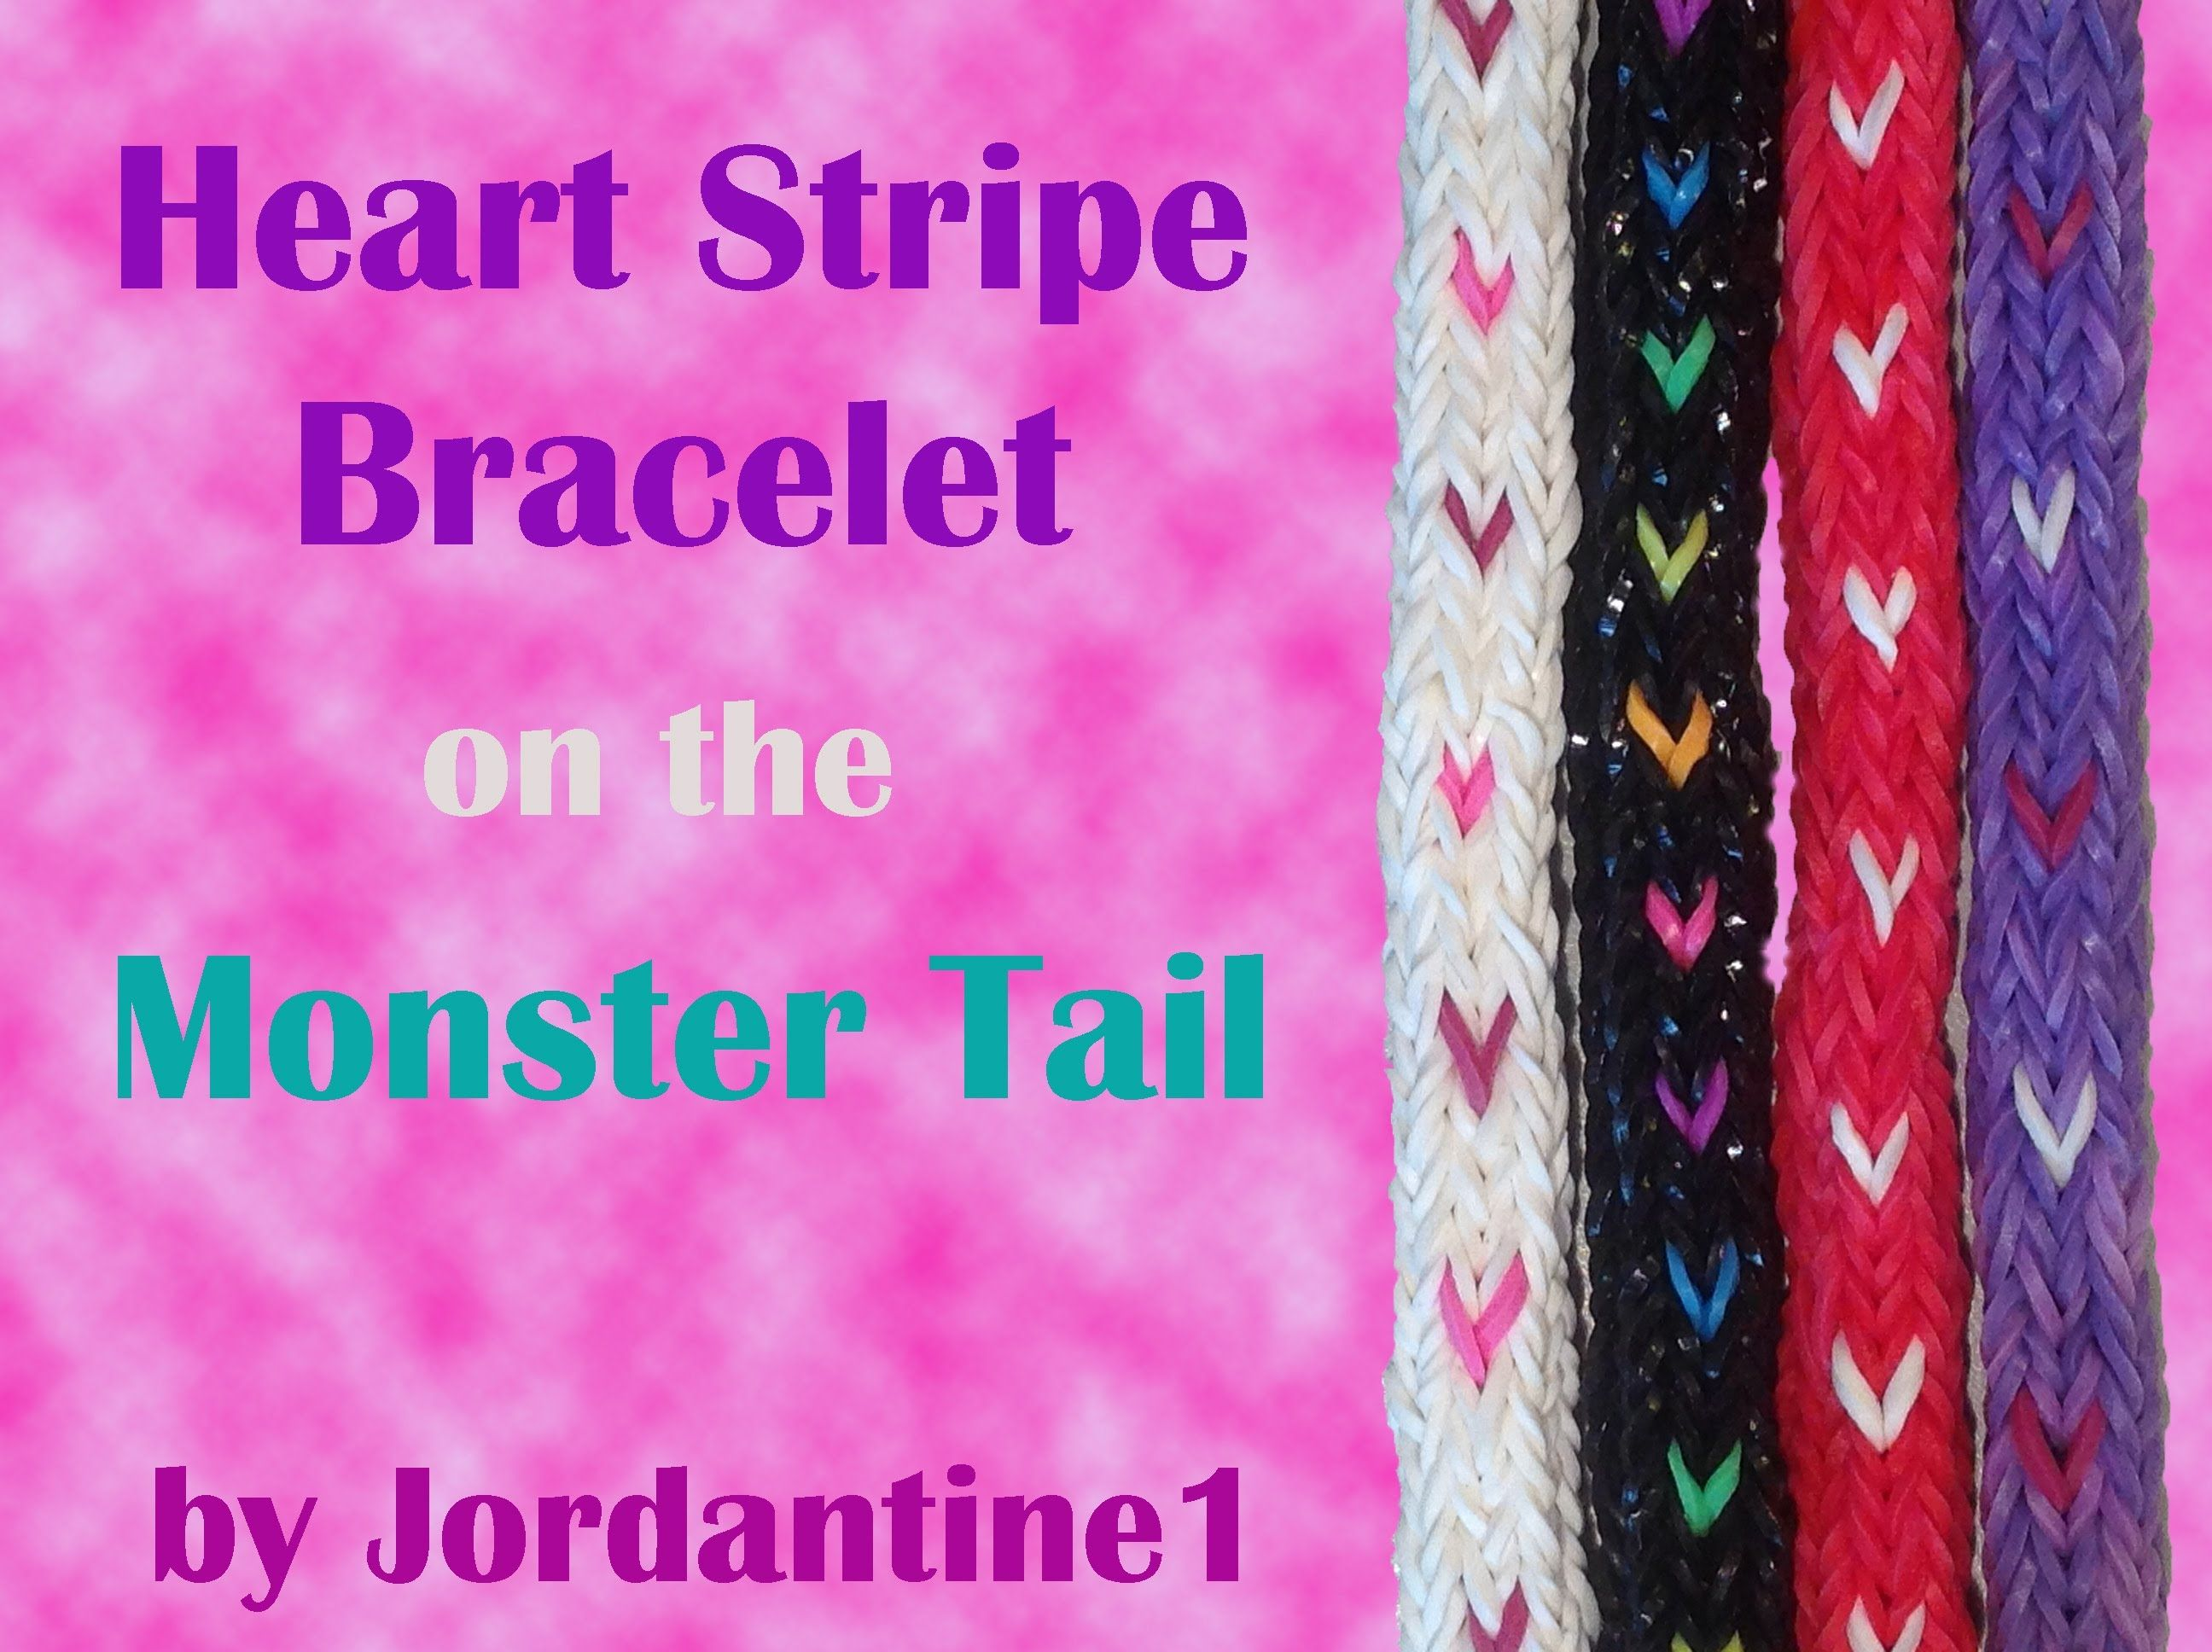 Heart Stripe Bracelet made on the Monster Tail - Rainbow Loom